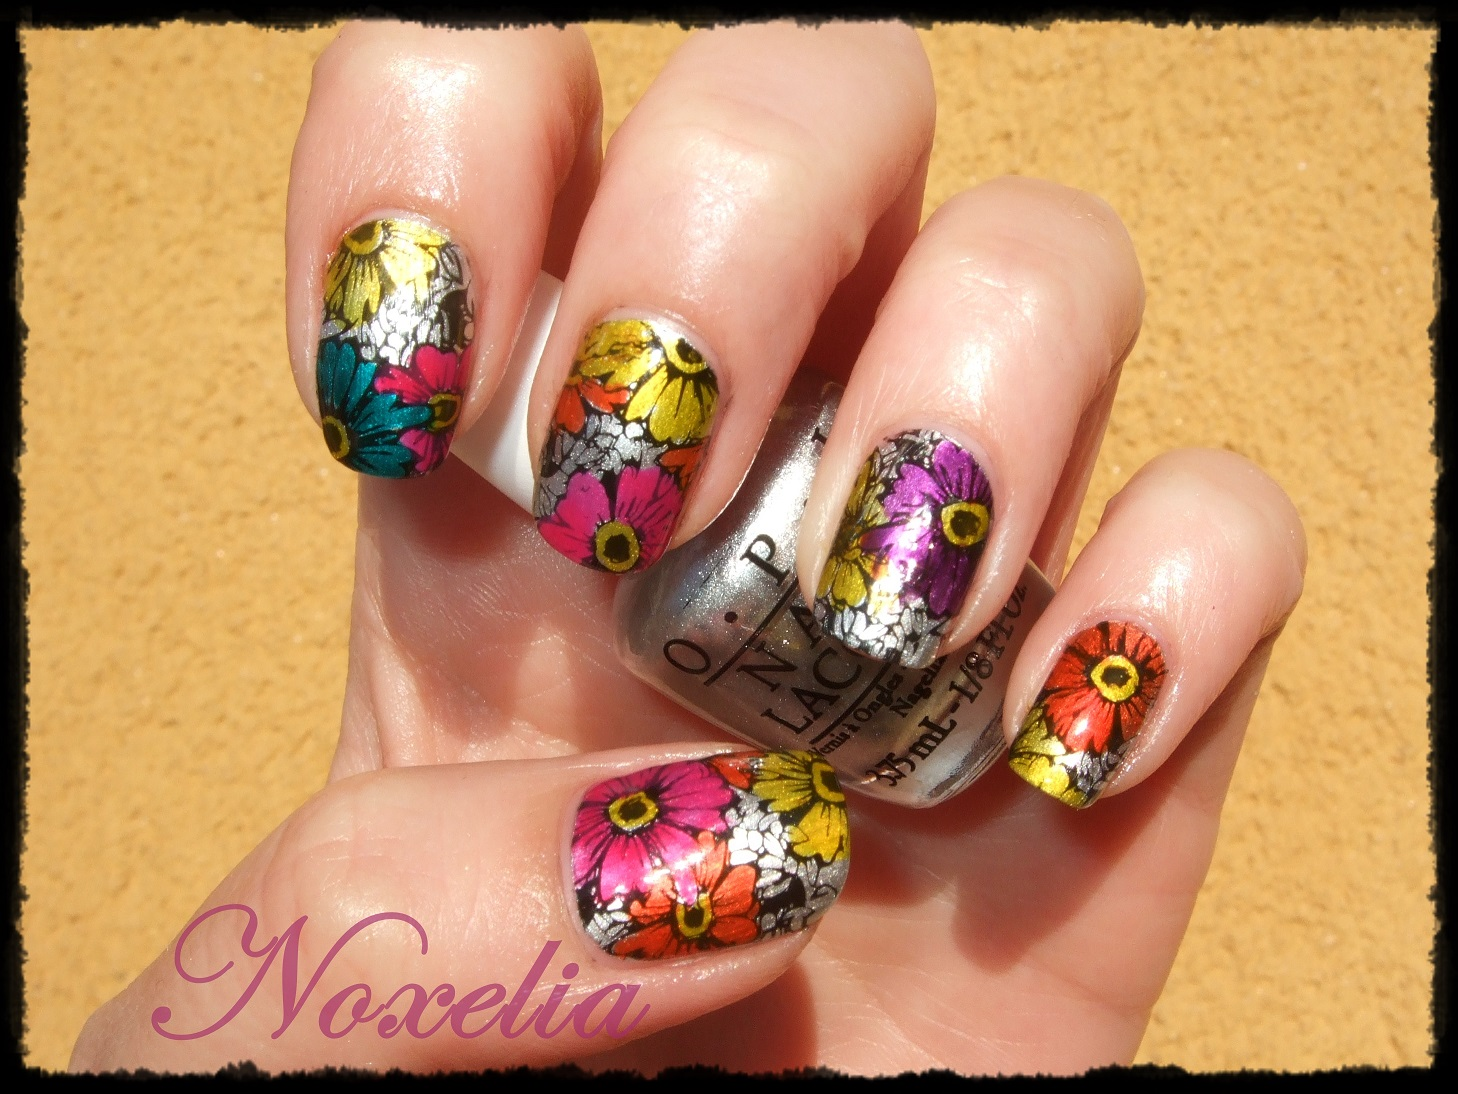 Noxelia: Stamping nail art: Look de uñas Nº 312. Color Paints Opi